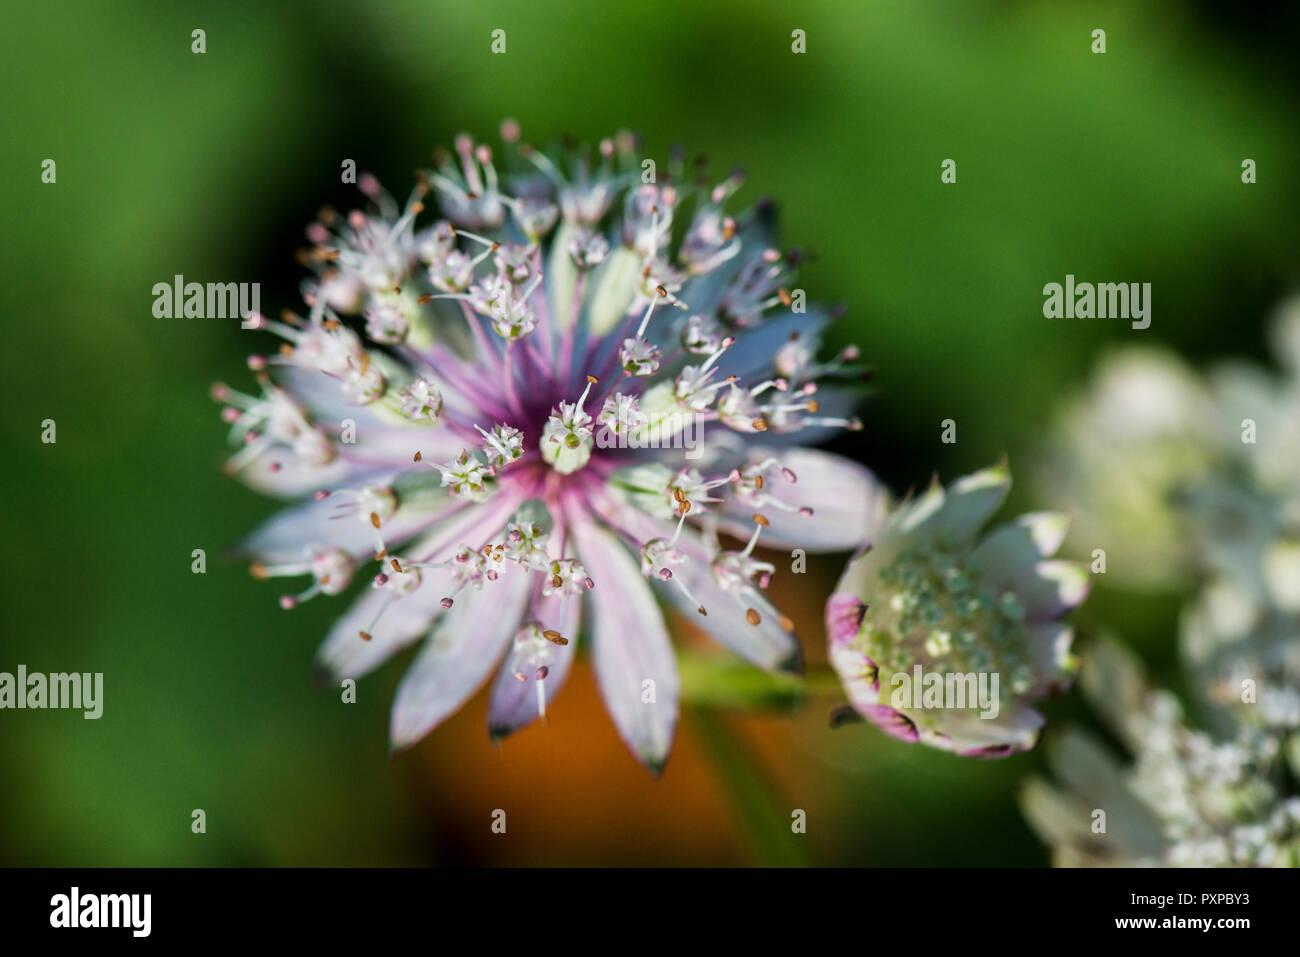 The flowers of a greater masterwort (Astrantia major)//////// Stock Photo